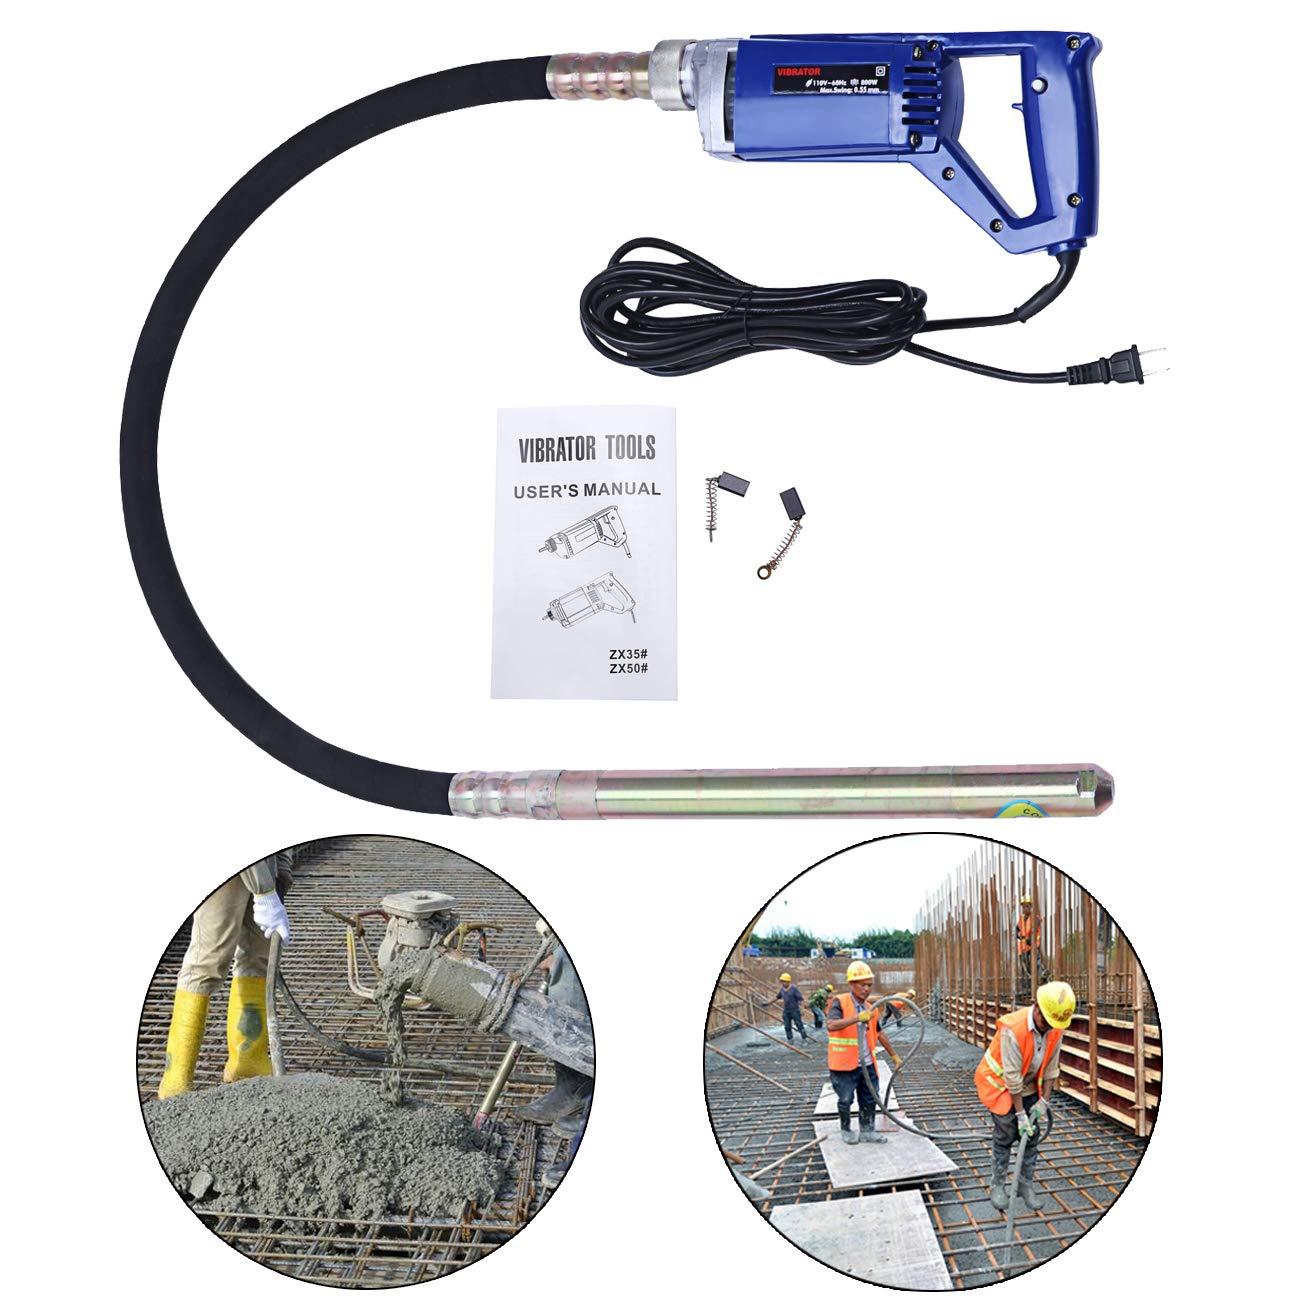 Bizoepro Portable 13000 RPM Concrete Vibrator 800W 3 4 HP Hand Operated Remove Air Bubbles handheld Construction Vibrator